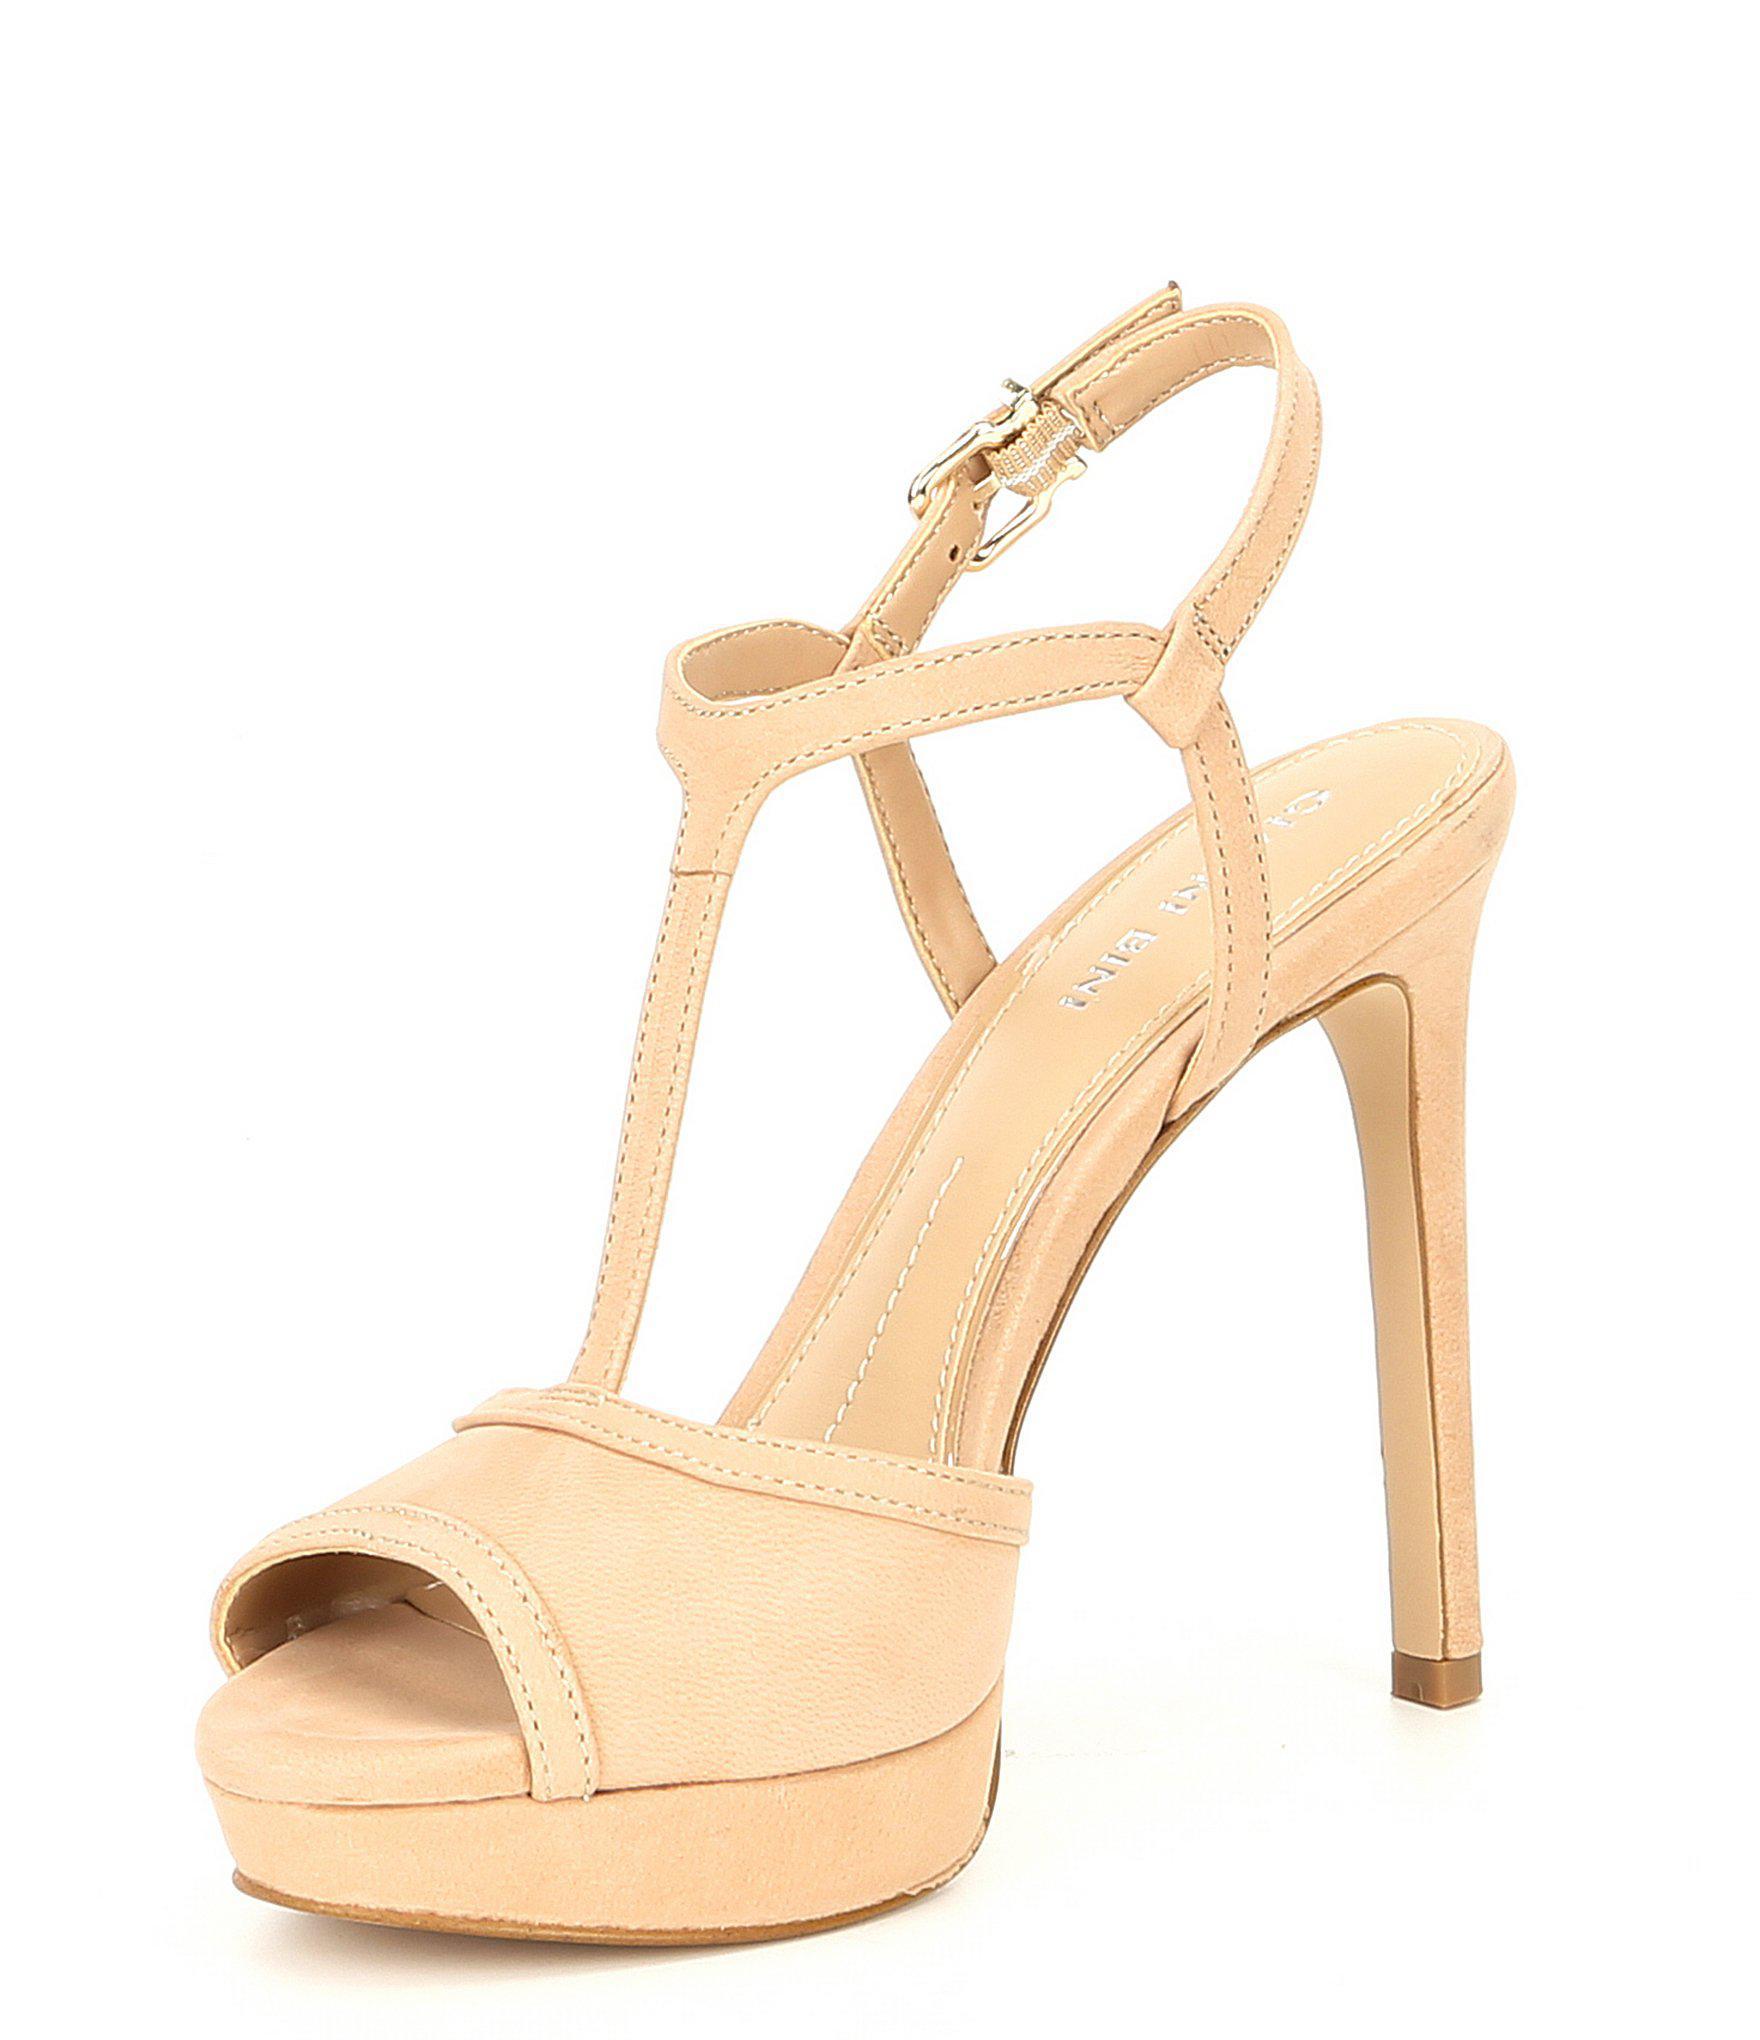 cddc9de6373 Lyst - Gianni Bini Kayler Platform Sandals